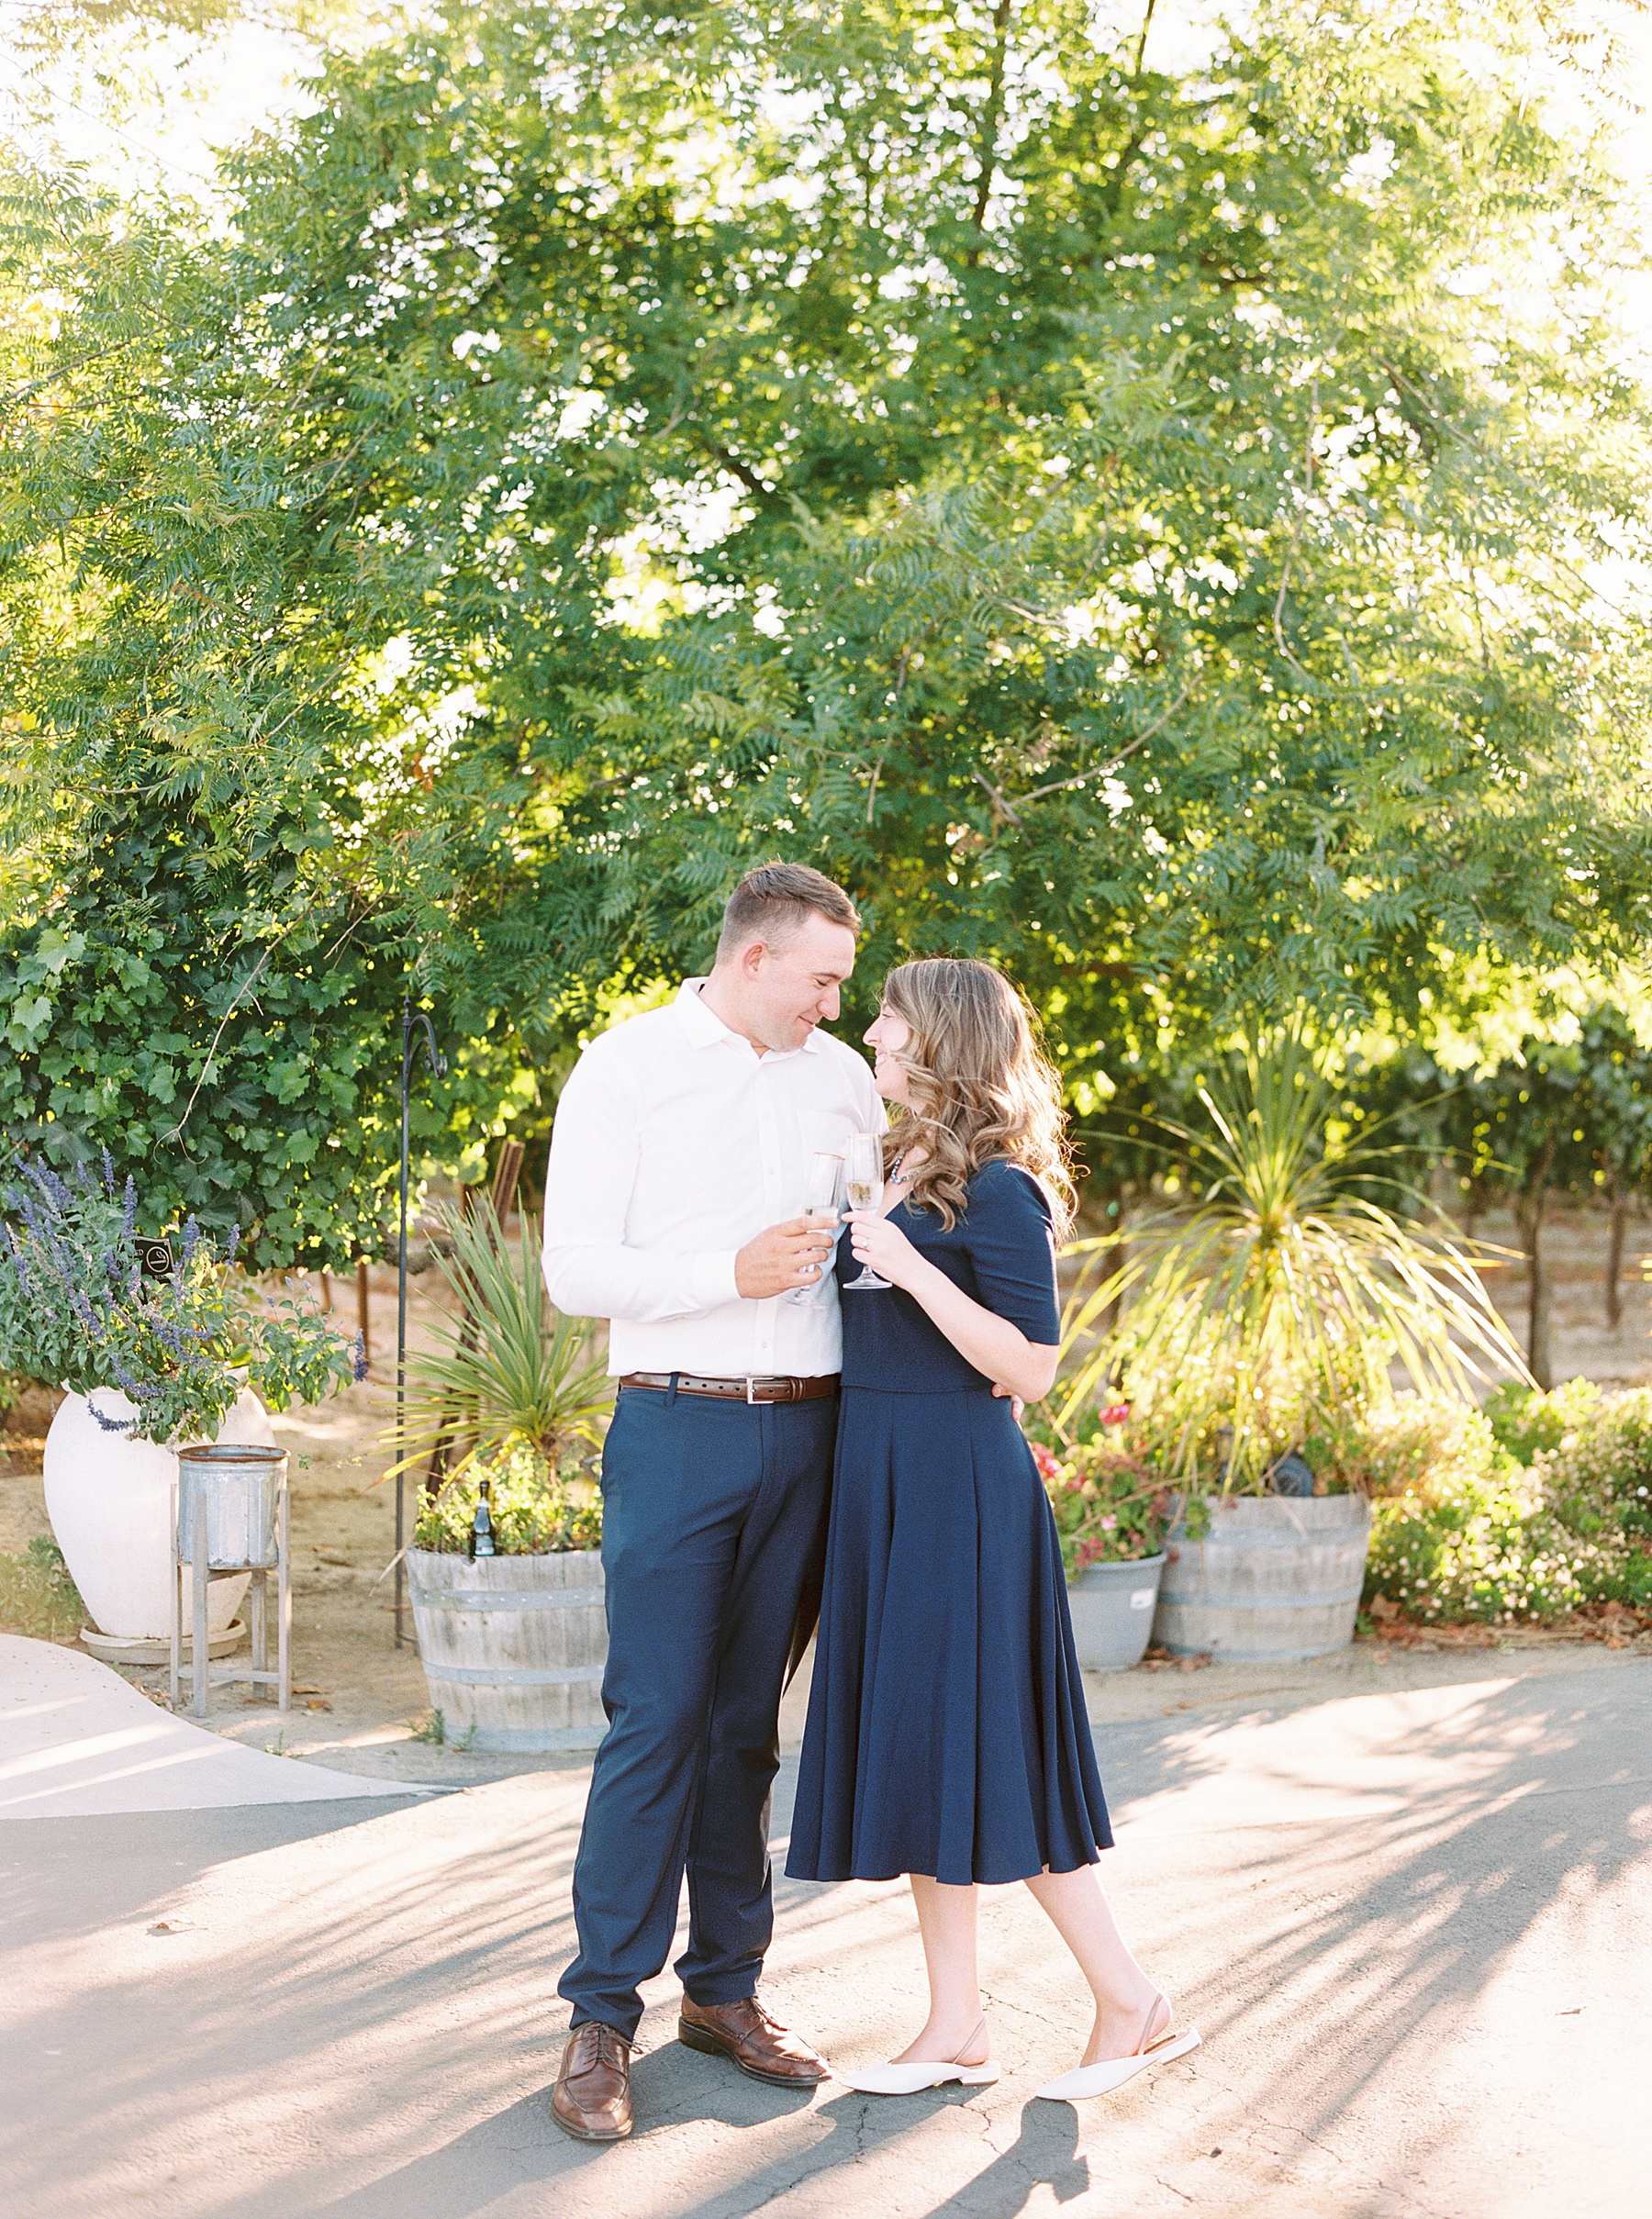 Scribner Bend Winery Engagement Session - Courtney and Steven - Ashley Baumgartner - Sribner Bend Wedding Photographer - Sacramento Wedding Photographer_0007.jpg